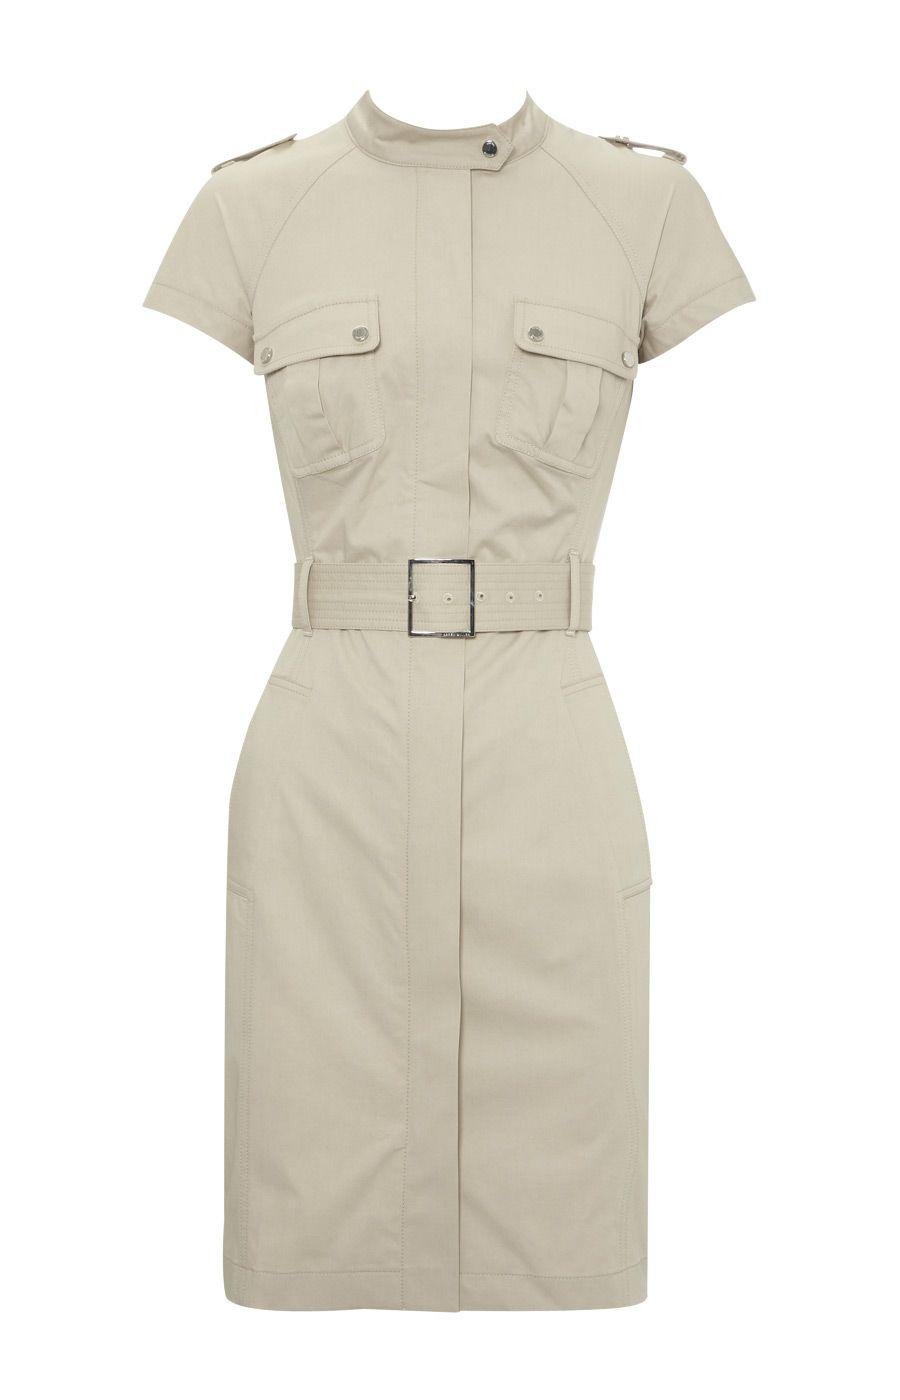 824ecf3f99b2 Karen Millen Tailored Safari Dress Stone